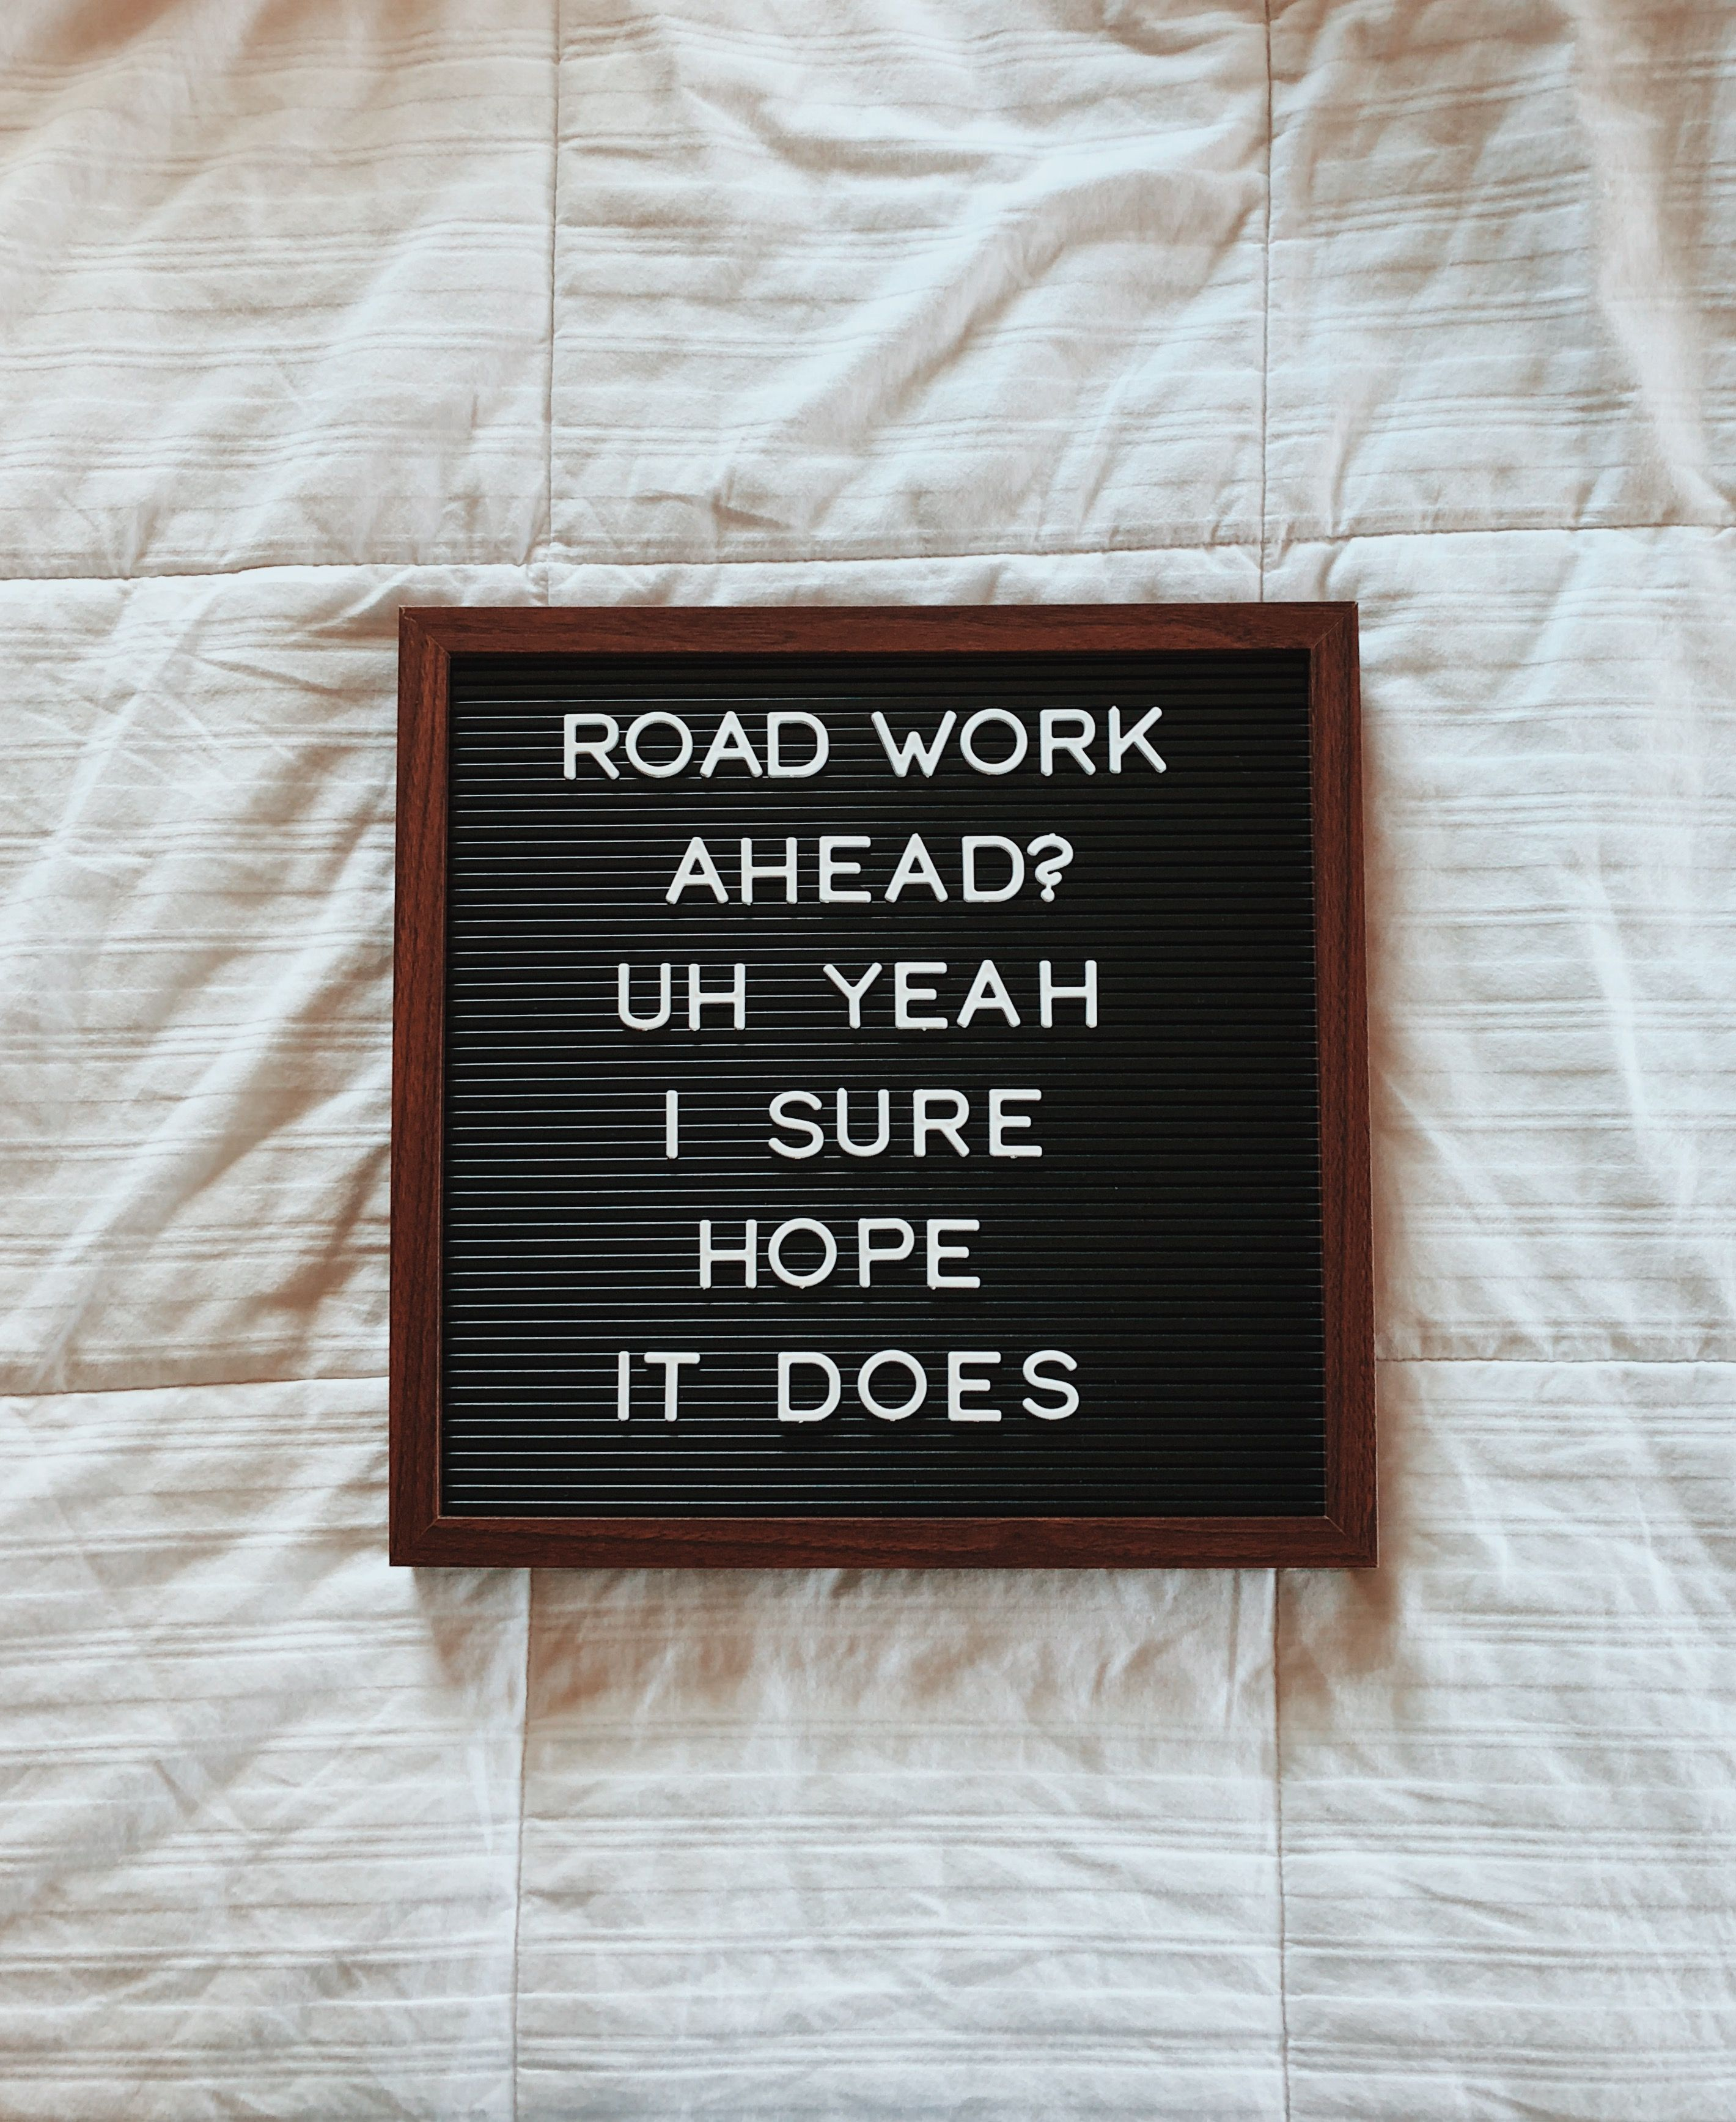 Road Work Ahead Vine Letterboard Room Decor Vine Quote Felt Letter Board Letter Board